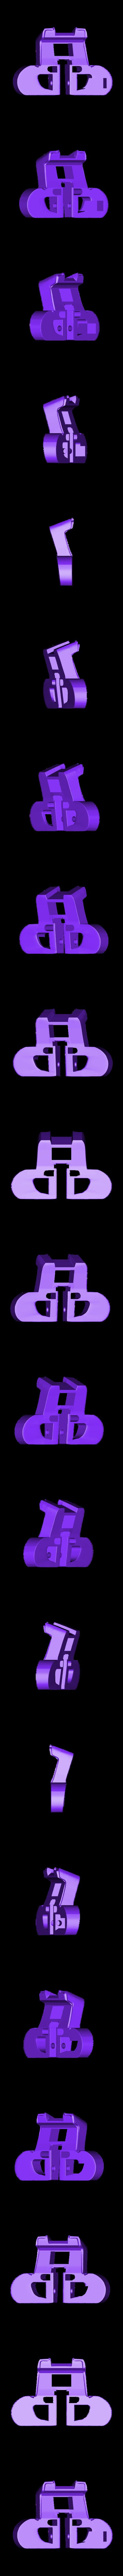 Lucio_gripReceiver.stl Download free STL file Overwatch Lucio Blaster • 3D printer object, Adafruit